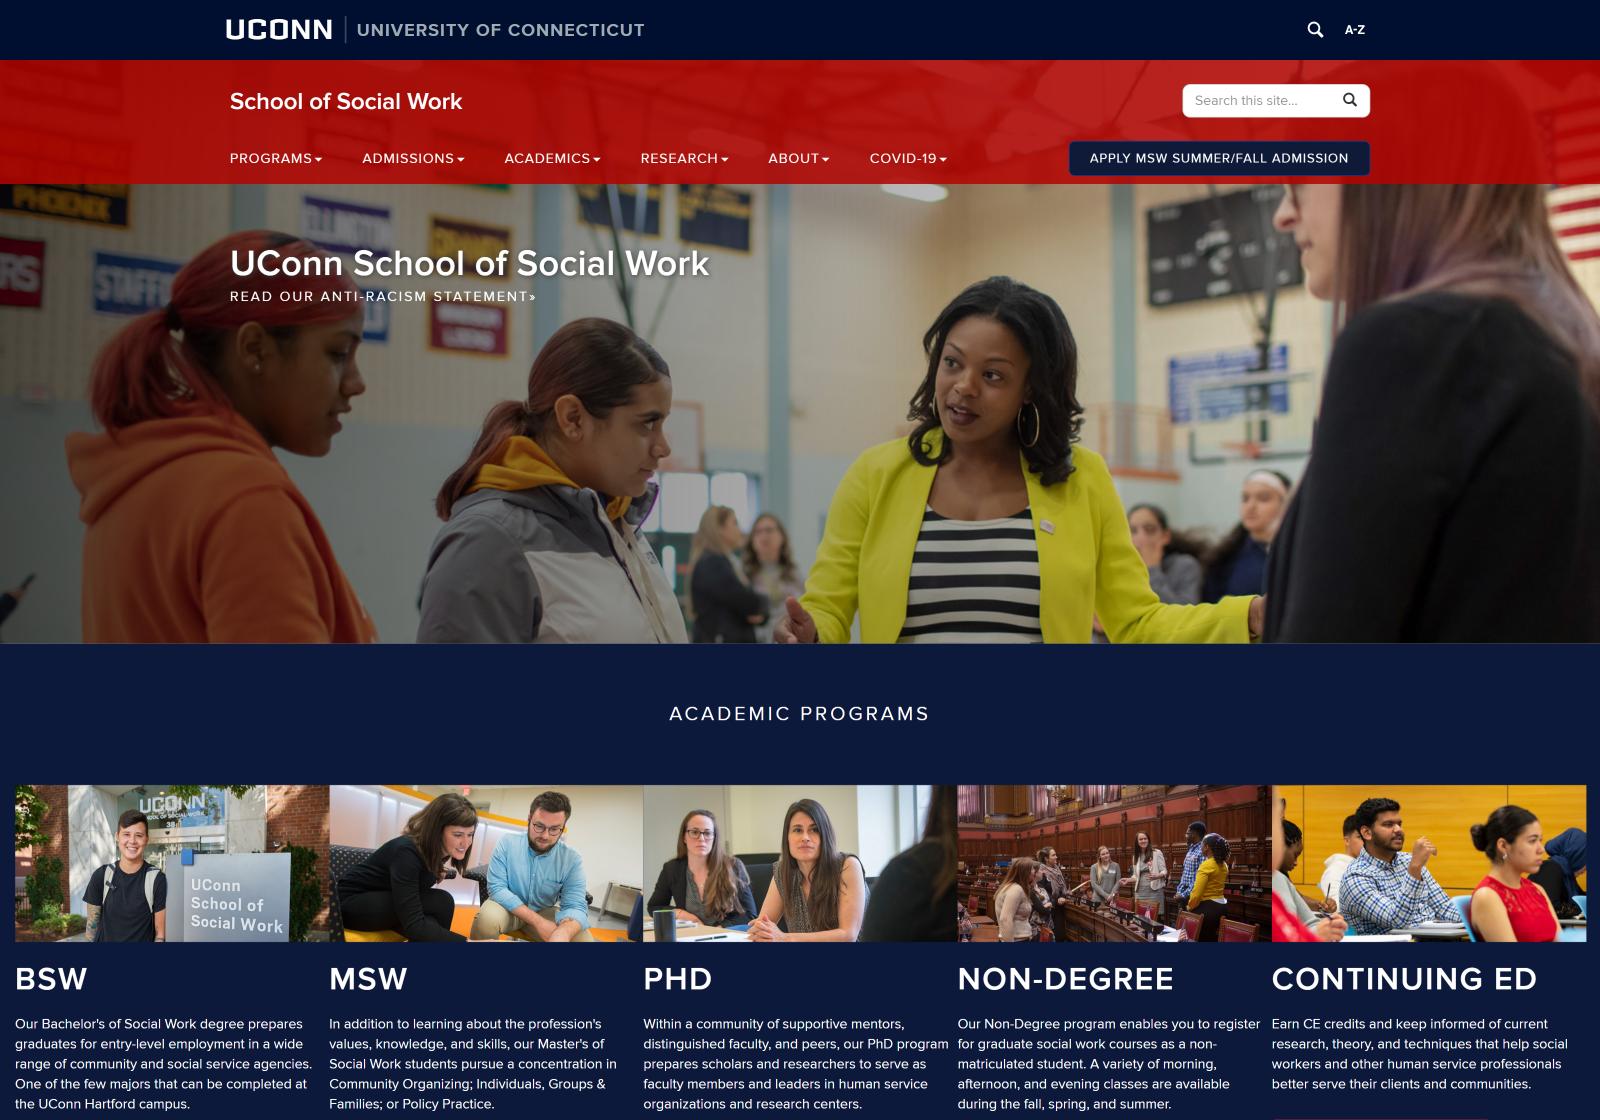 Desktop view of the UConn School of Social Work website